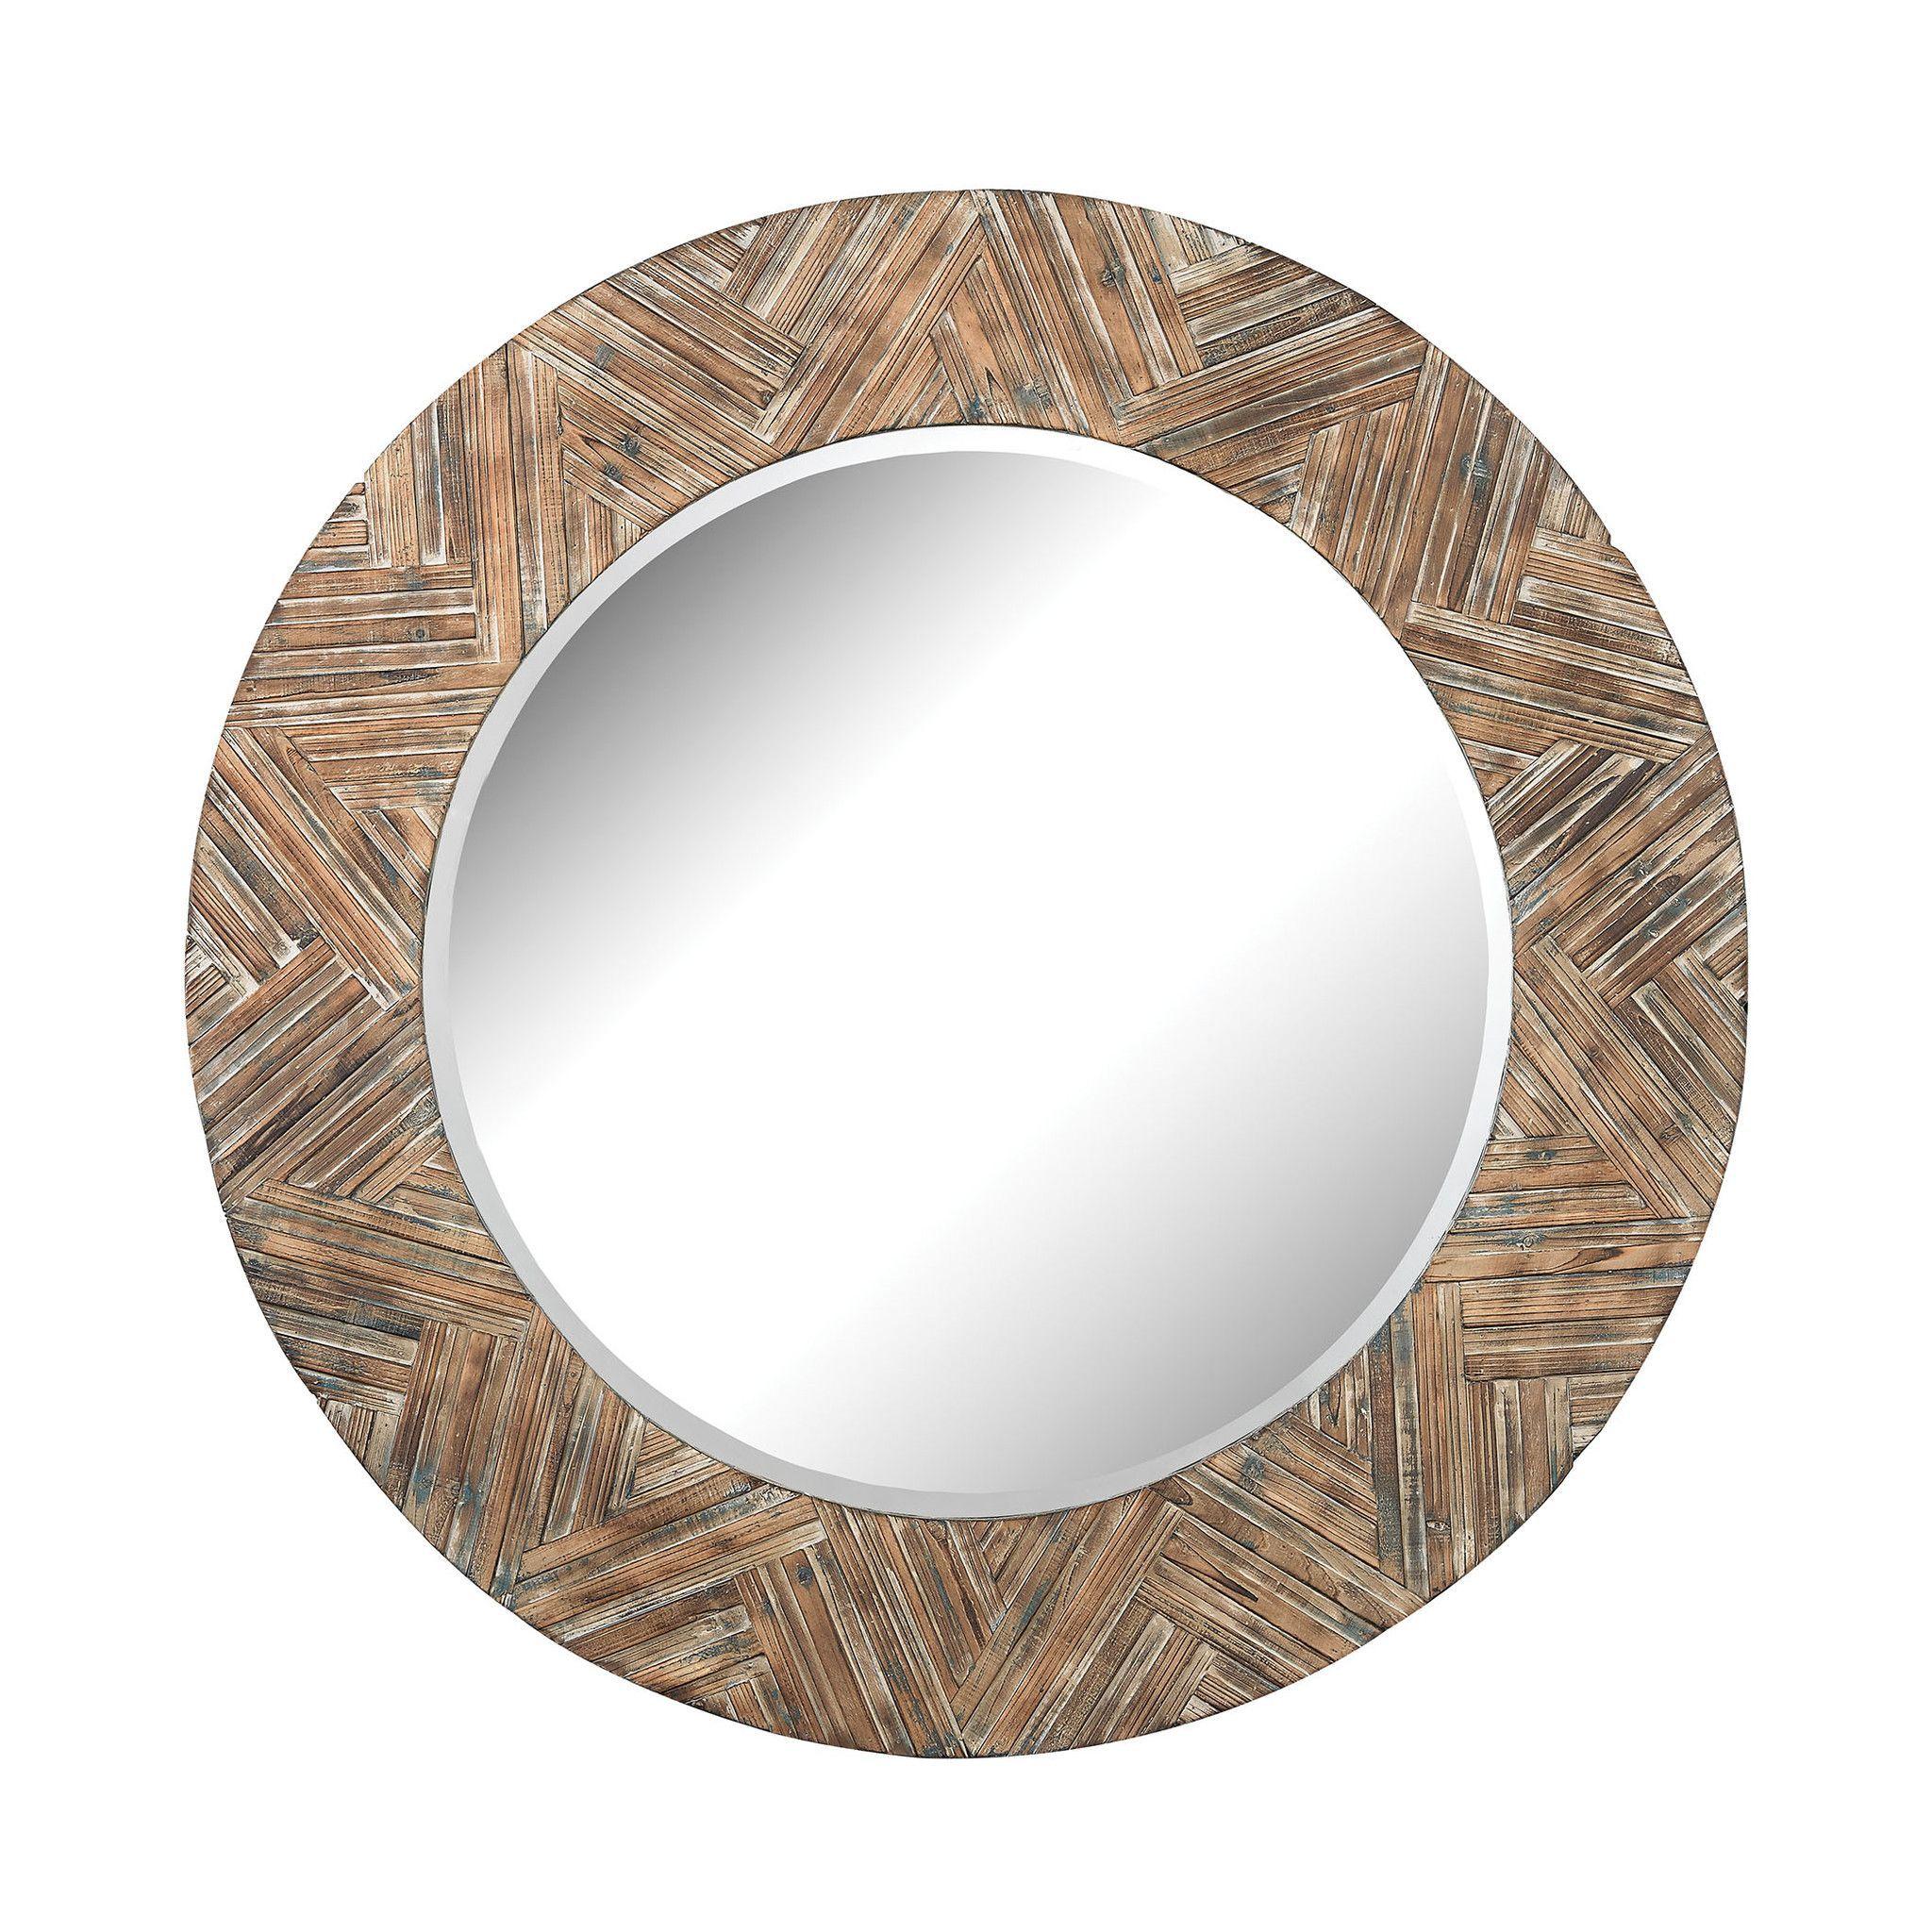 large round wicker mirror design by lazy susan